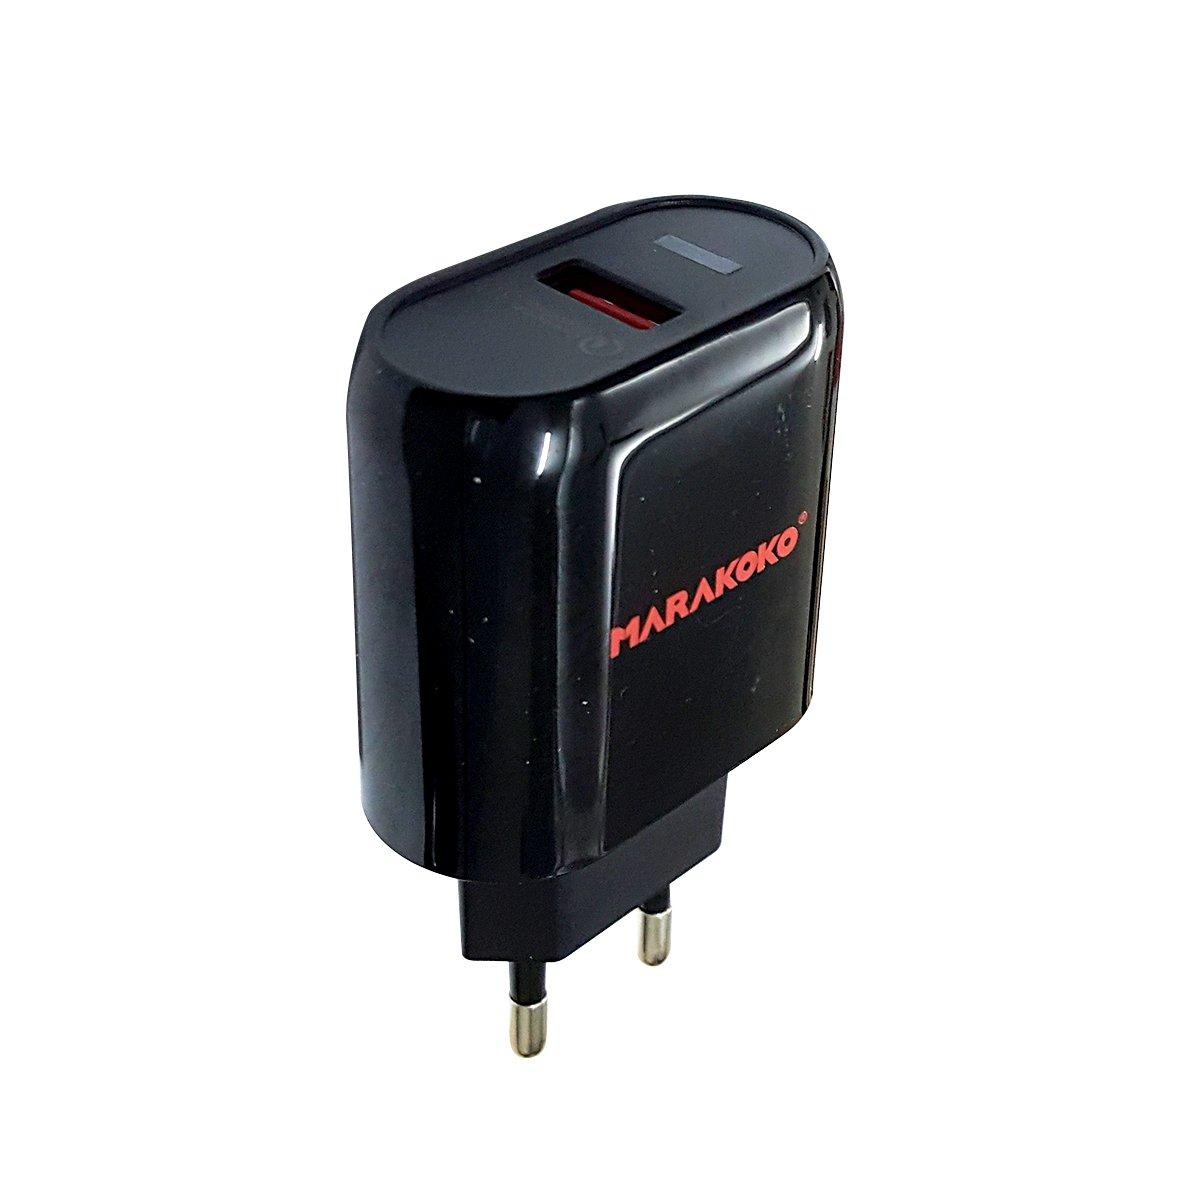 Sạc điện thoại Marakoko MA15, 1 cổng Quick Charge 3.0, 18W